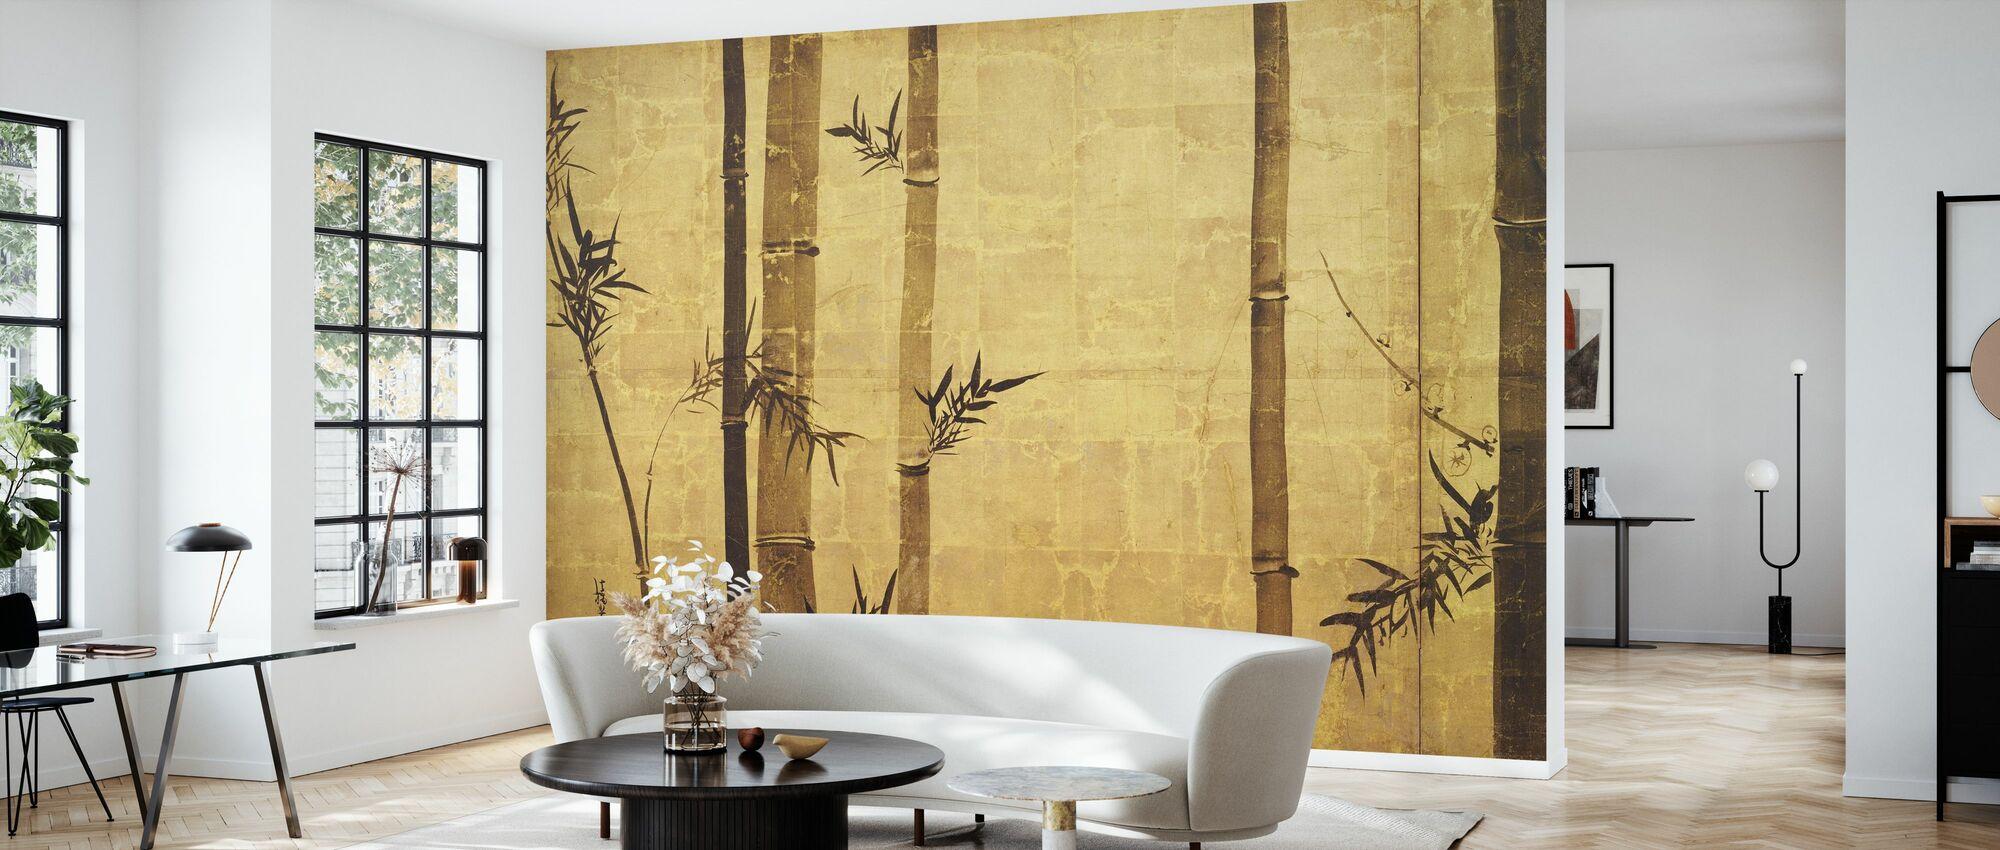 Bambù Zen - Carta da parati - Salotto